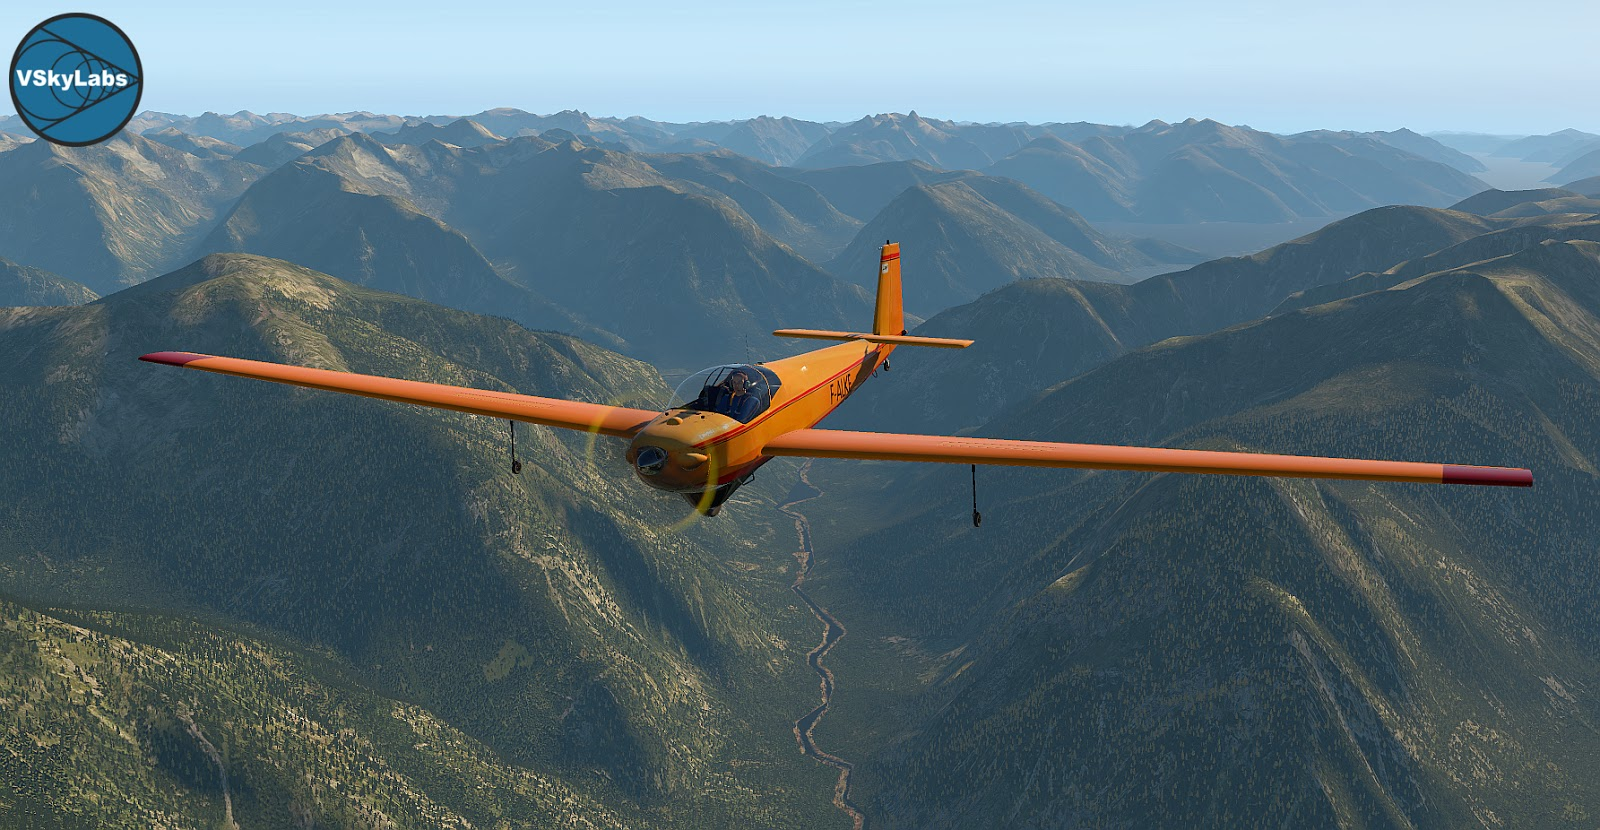 COMING SOON - VSKYLABS SF-25 Project